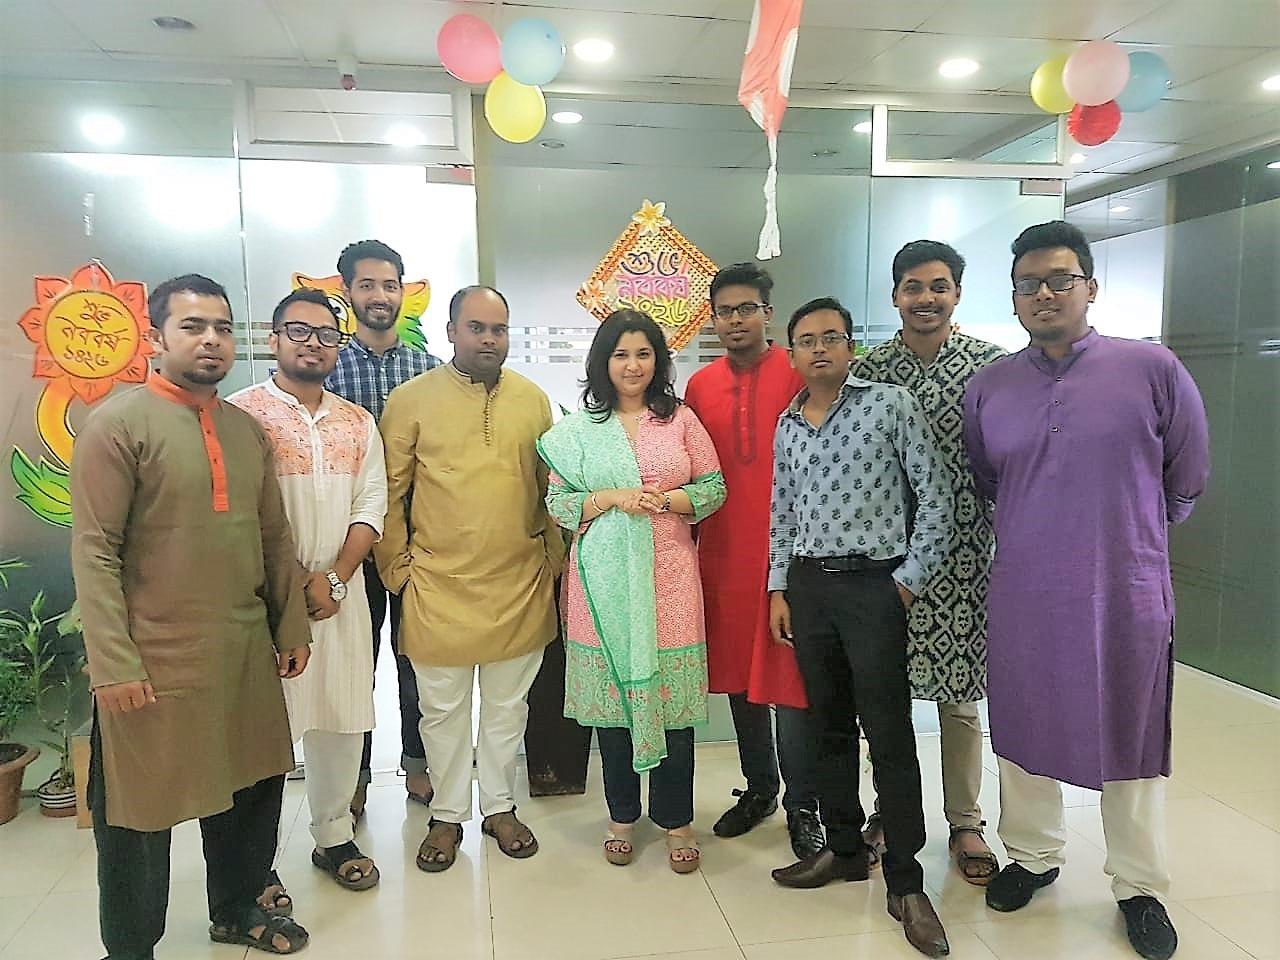 Snehasish Mahmud & Co.